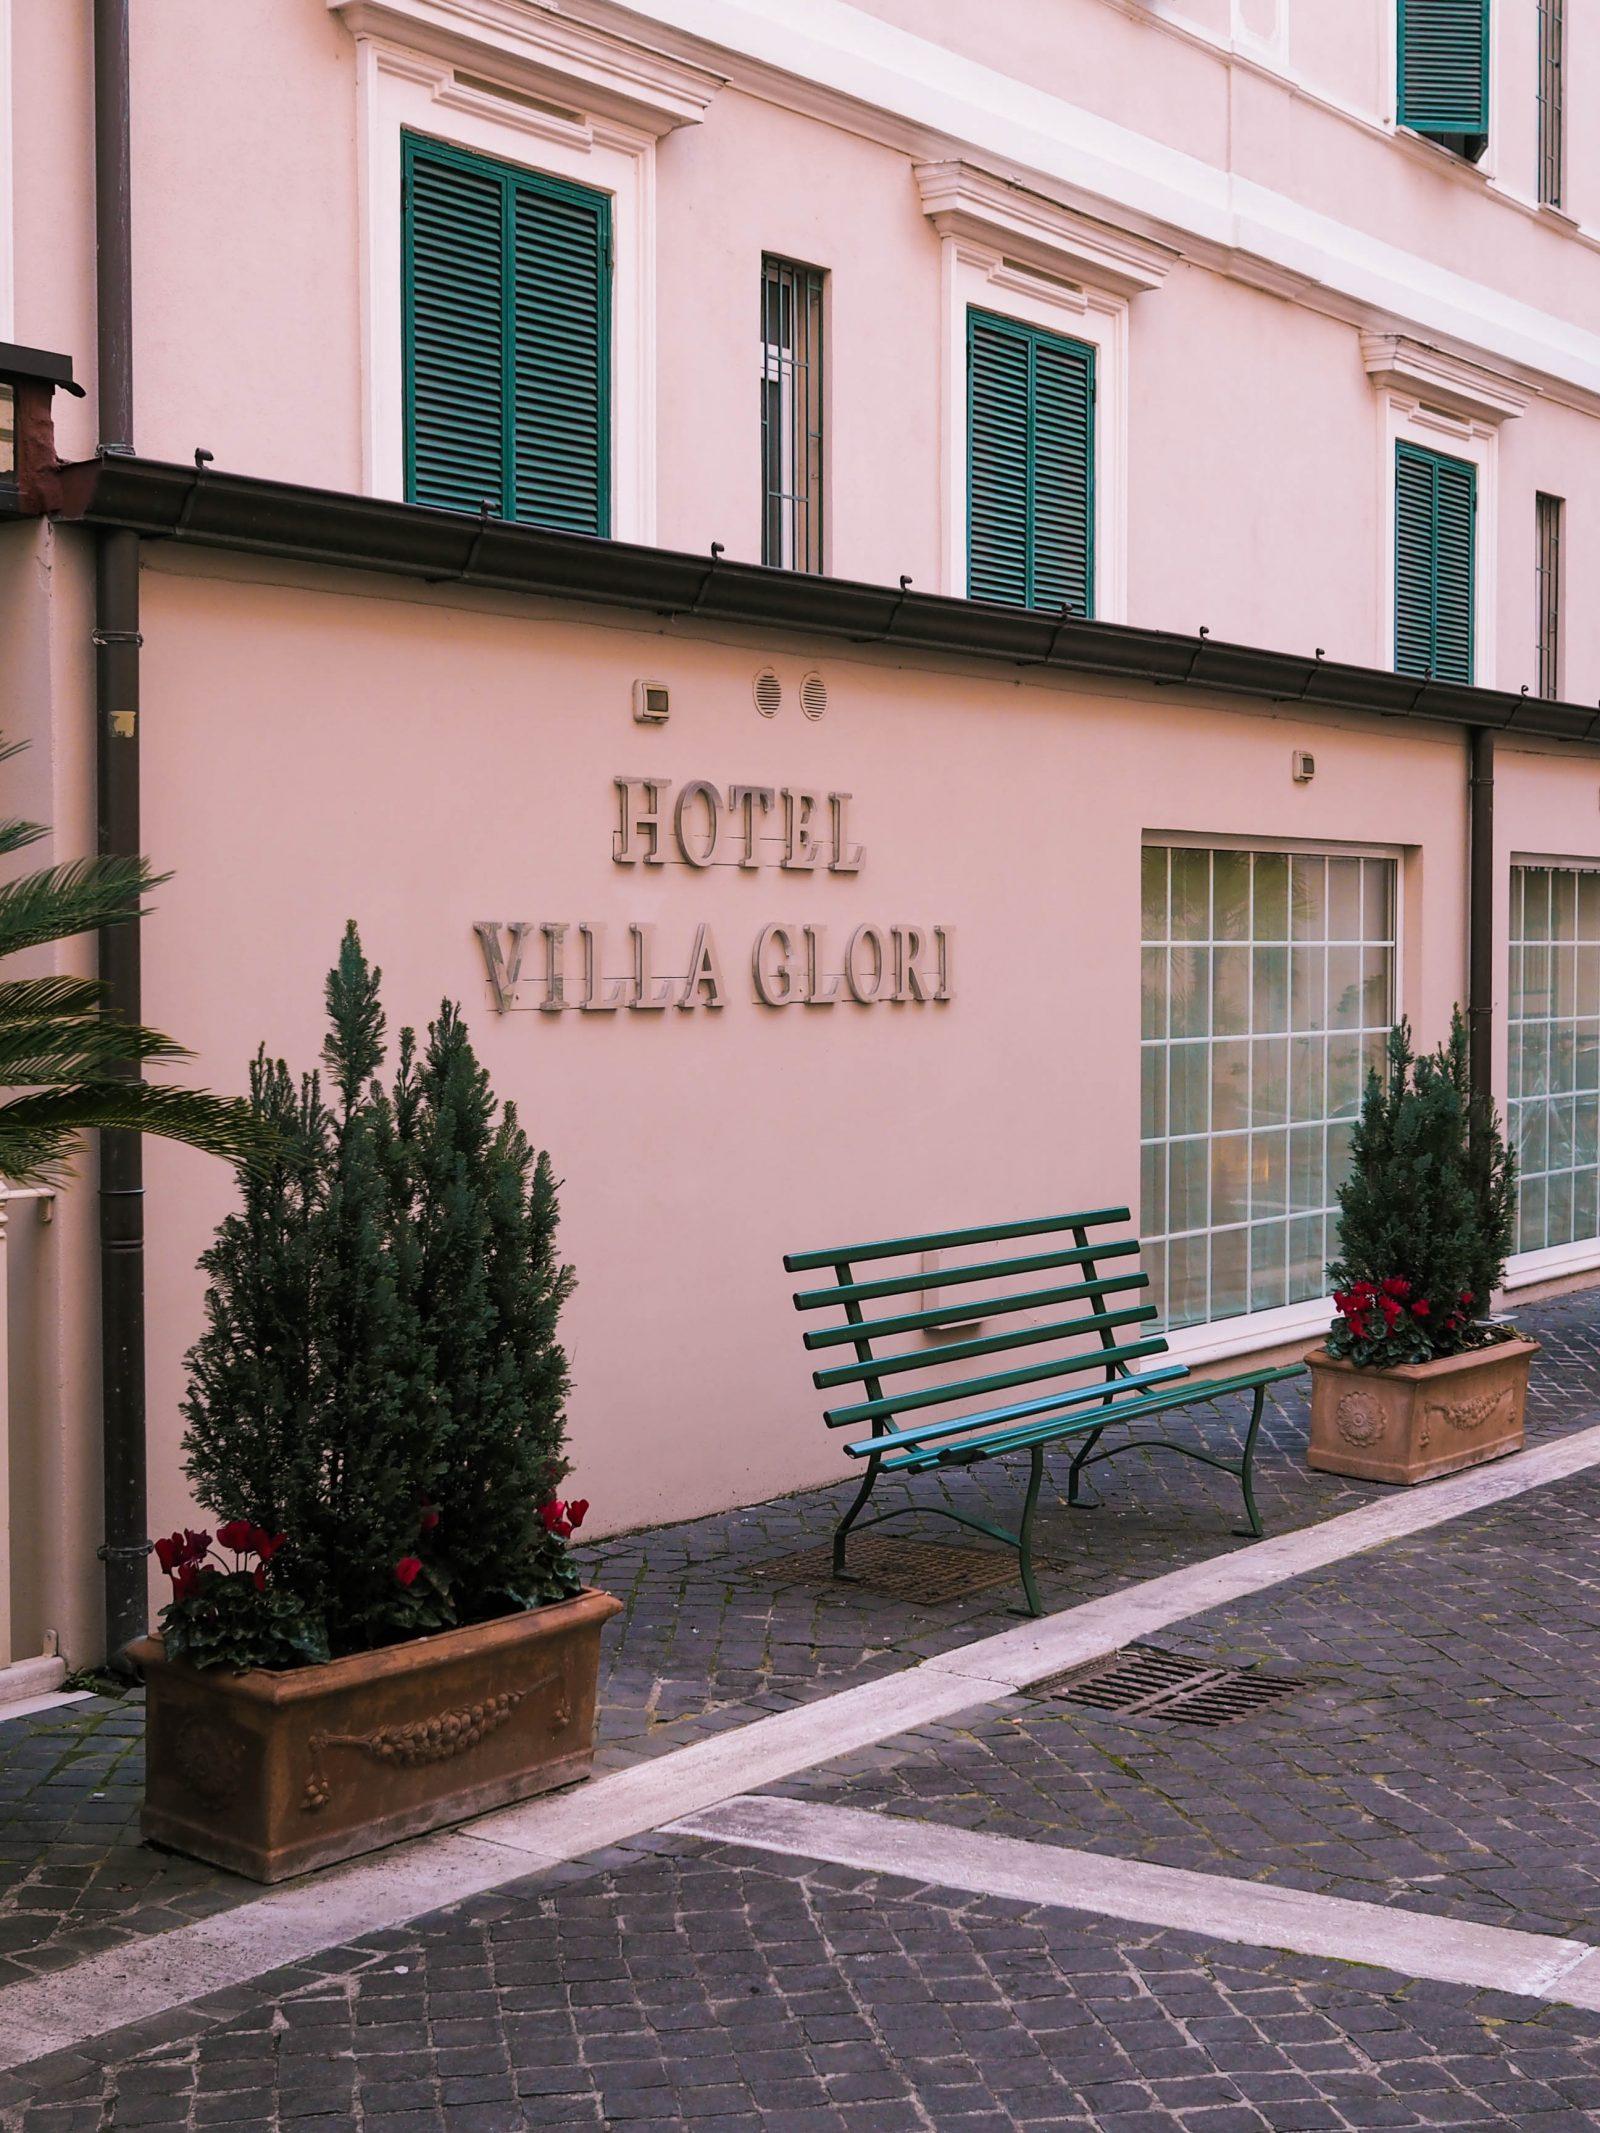 Hotel Villa Glori Rome | rhianna olivia